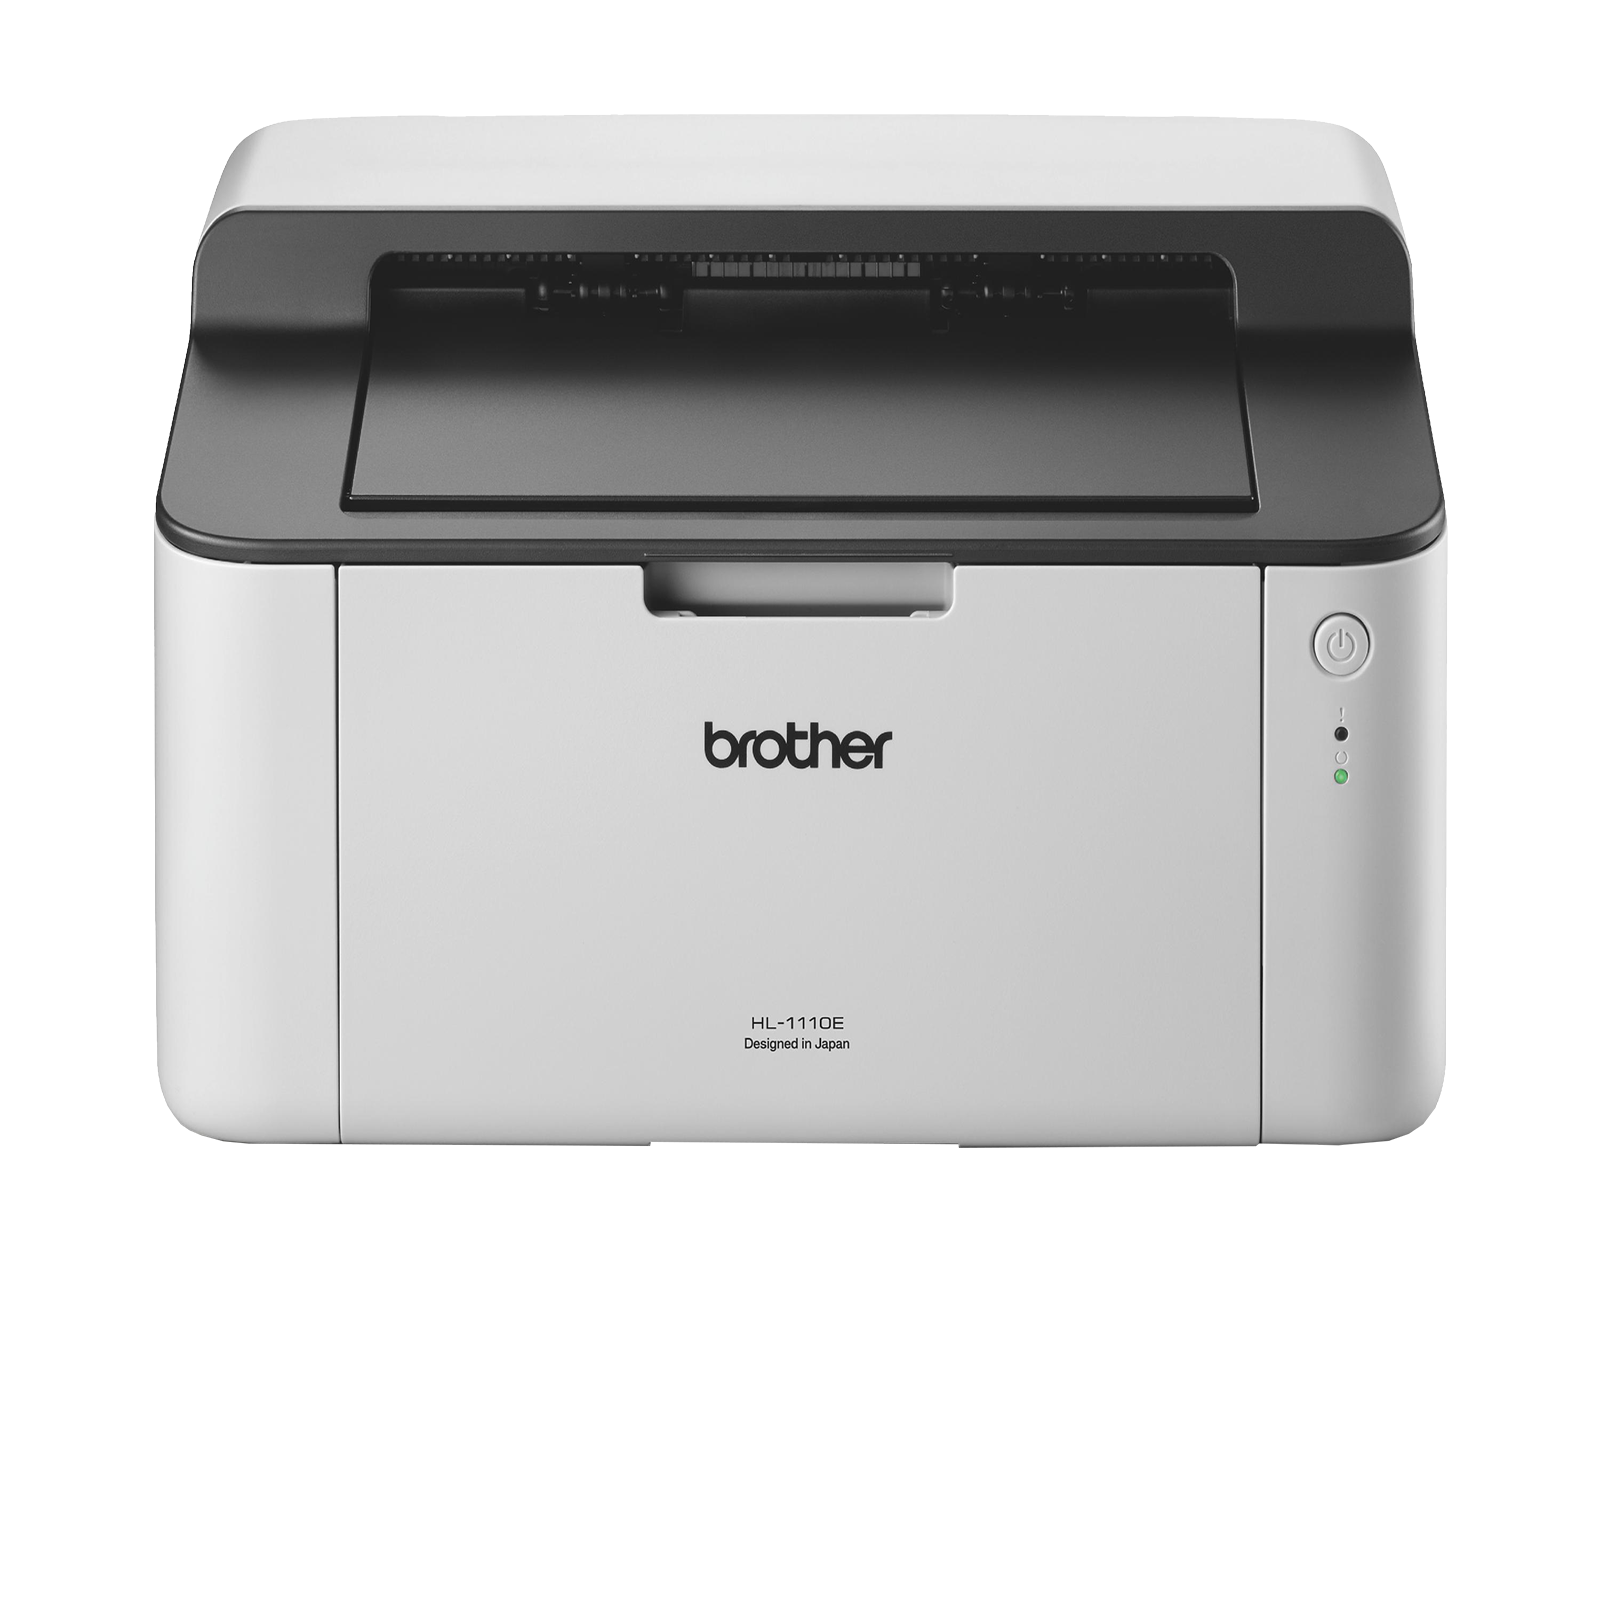 Brother HL1110E, Imprimanta laser mono A4, viteza printare: 20 ppm, rezolutie 600x600 dpi (2400x600 dpi cu Control rezoluţie), memorie 1 MB, fpo 23 sec, tava 150 coli, USB2.0, volum recomandat: 250 - 1800 pagini, volum lunar maxim: 10000 pag, consumabil: